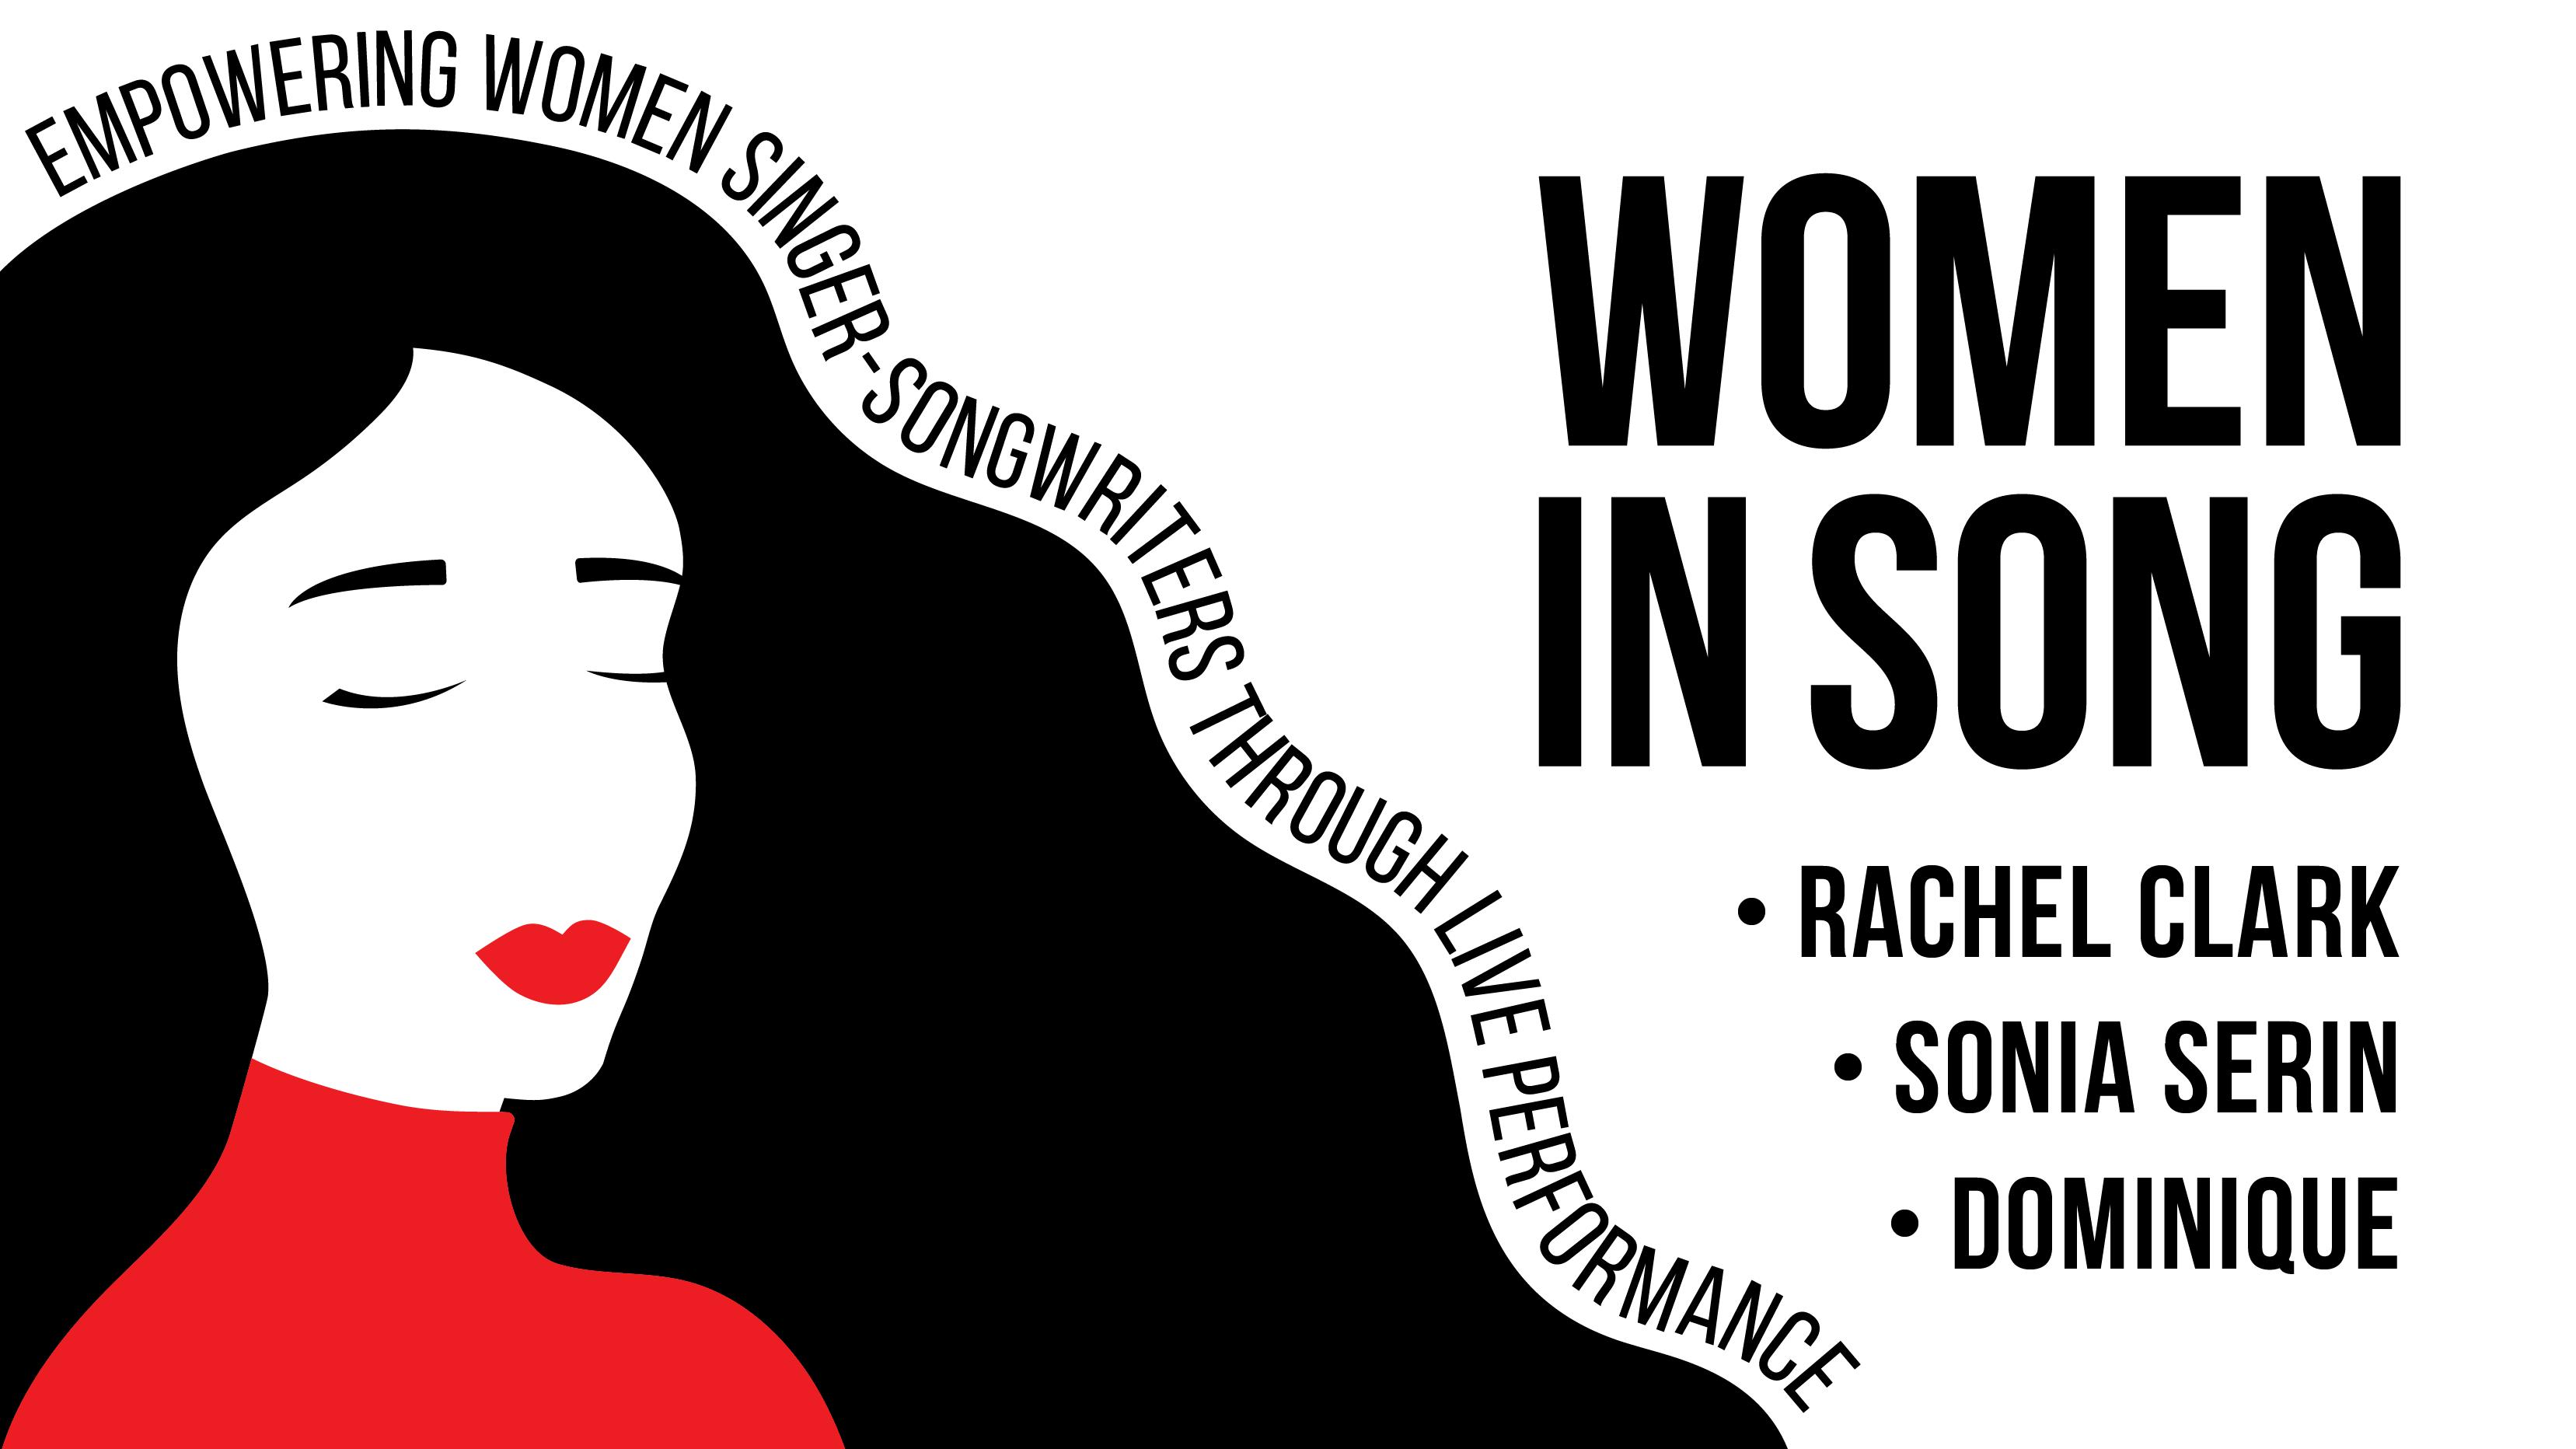 Women in Song Event